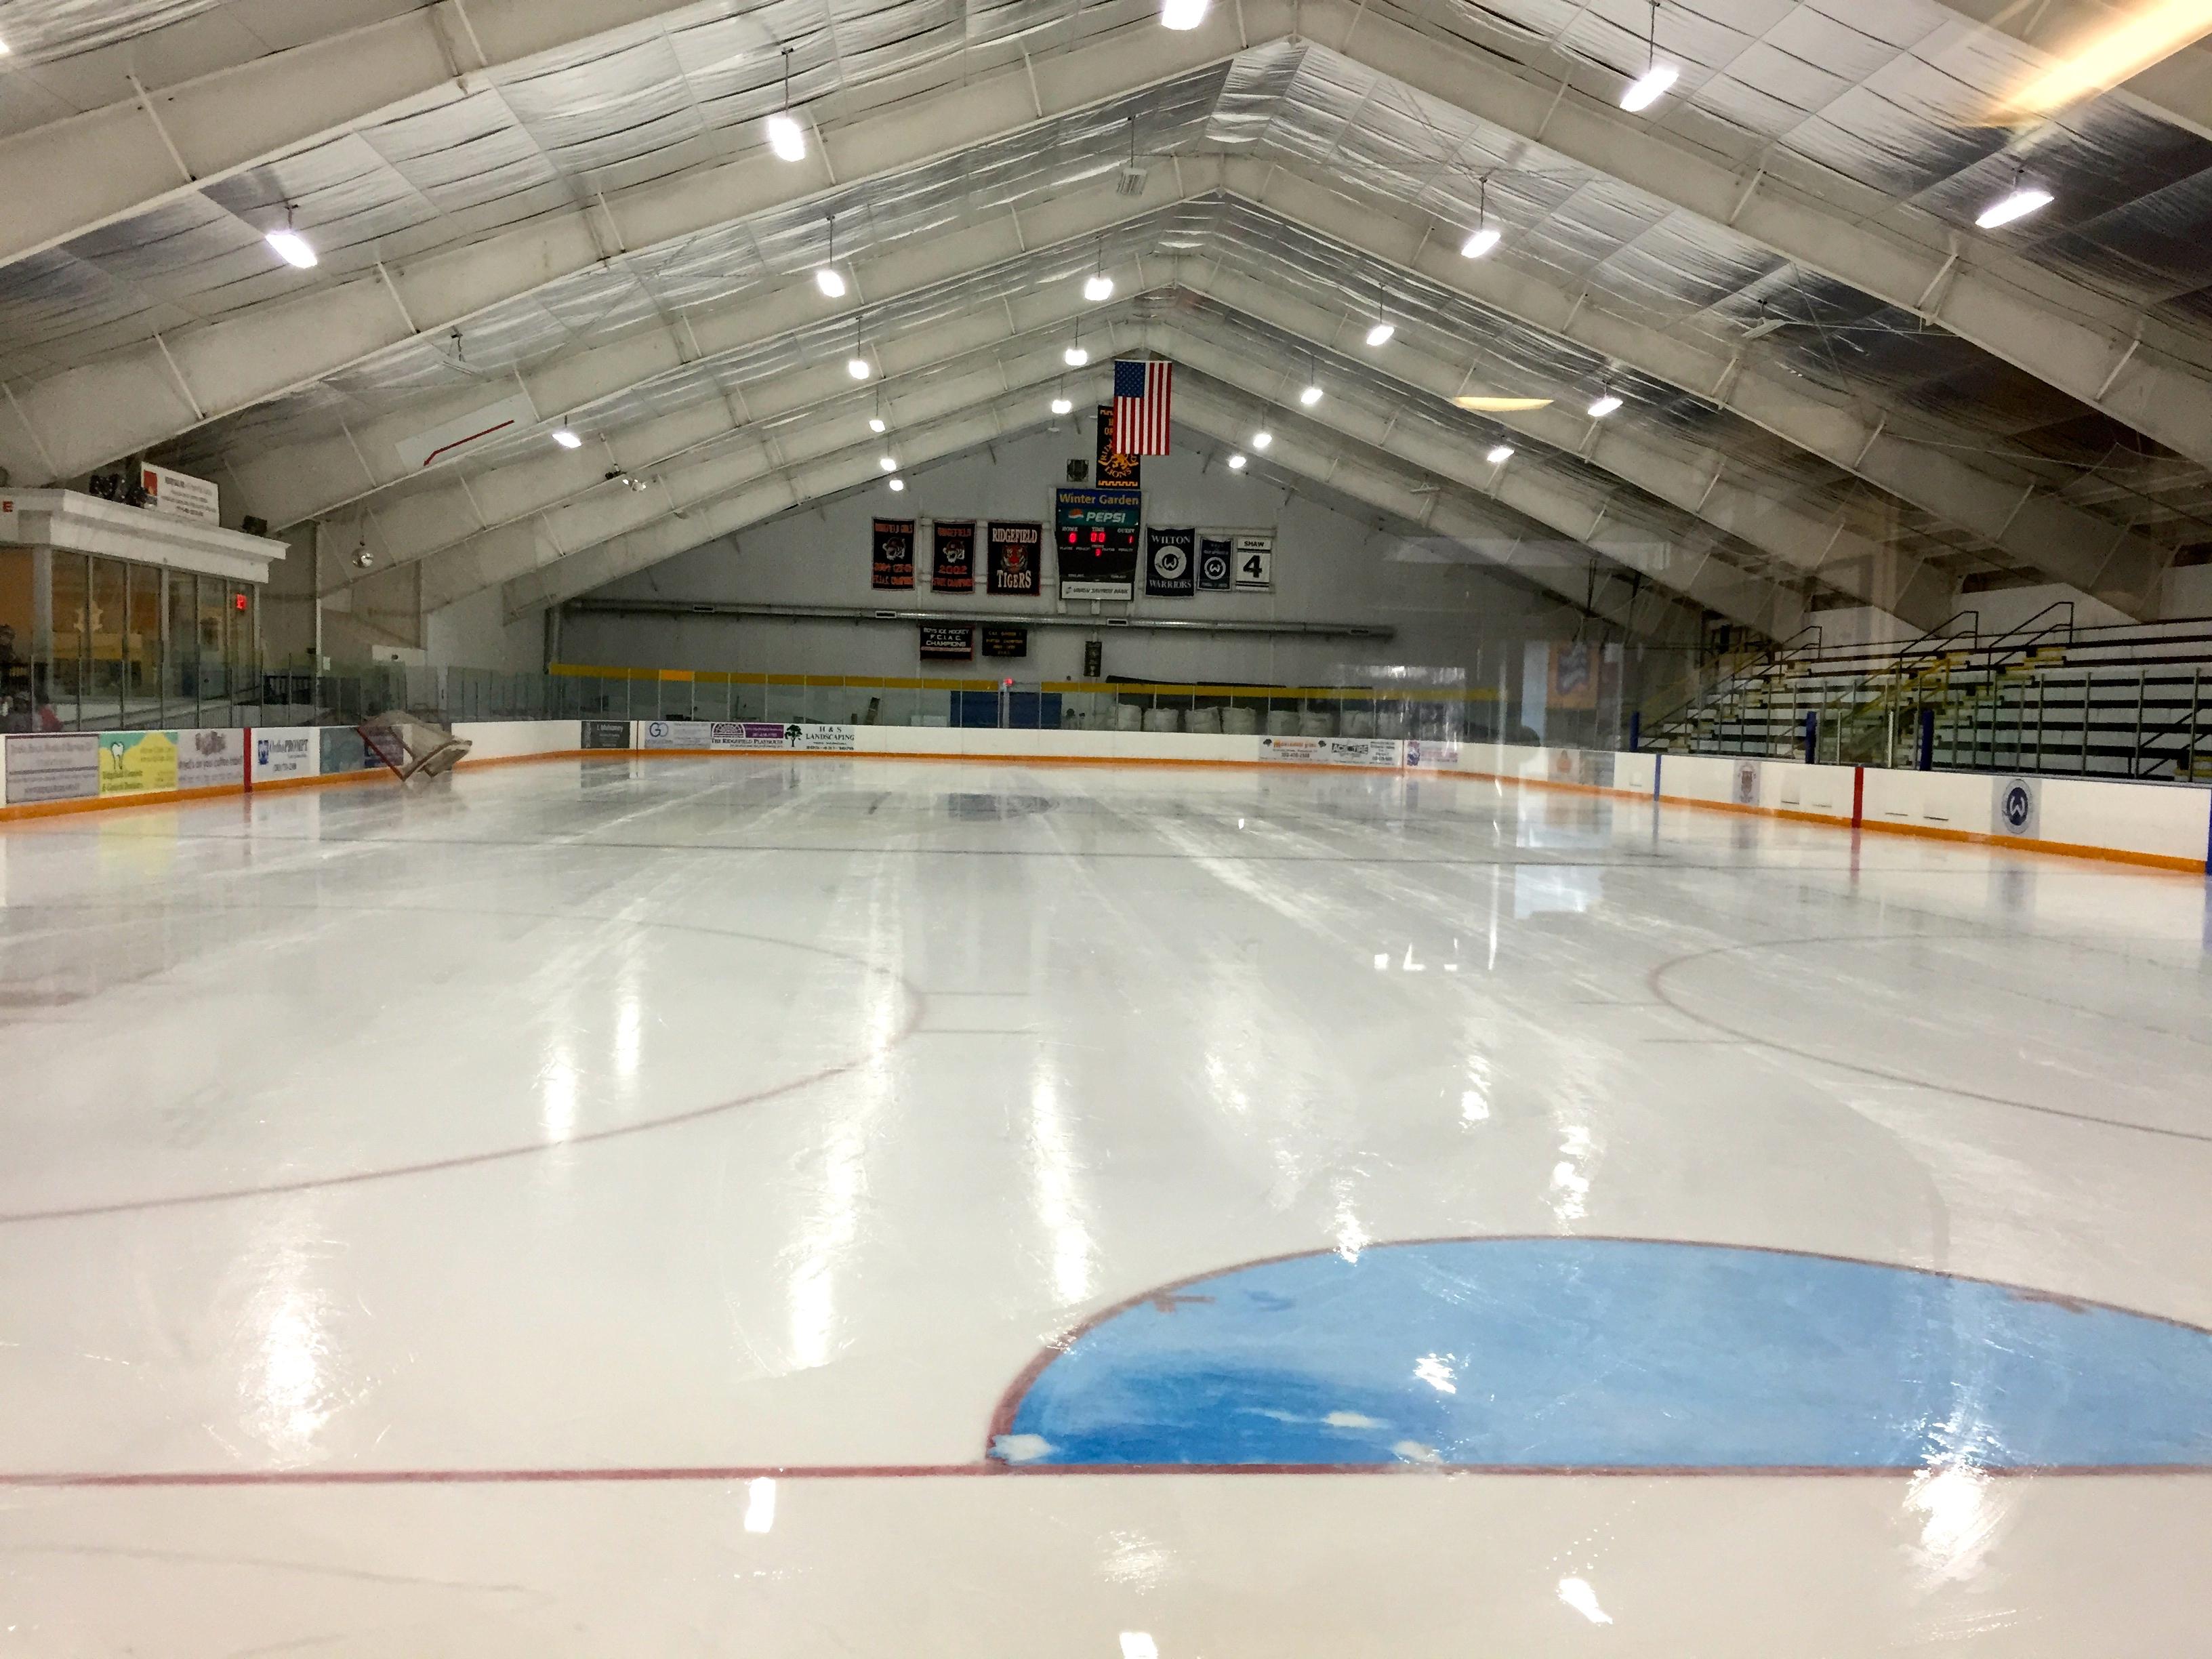 file winter garden ice arena jpg wikimedia commons